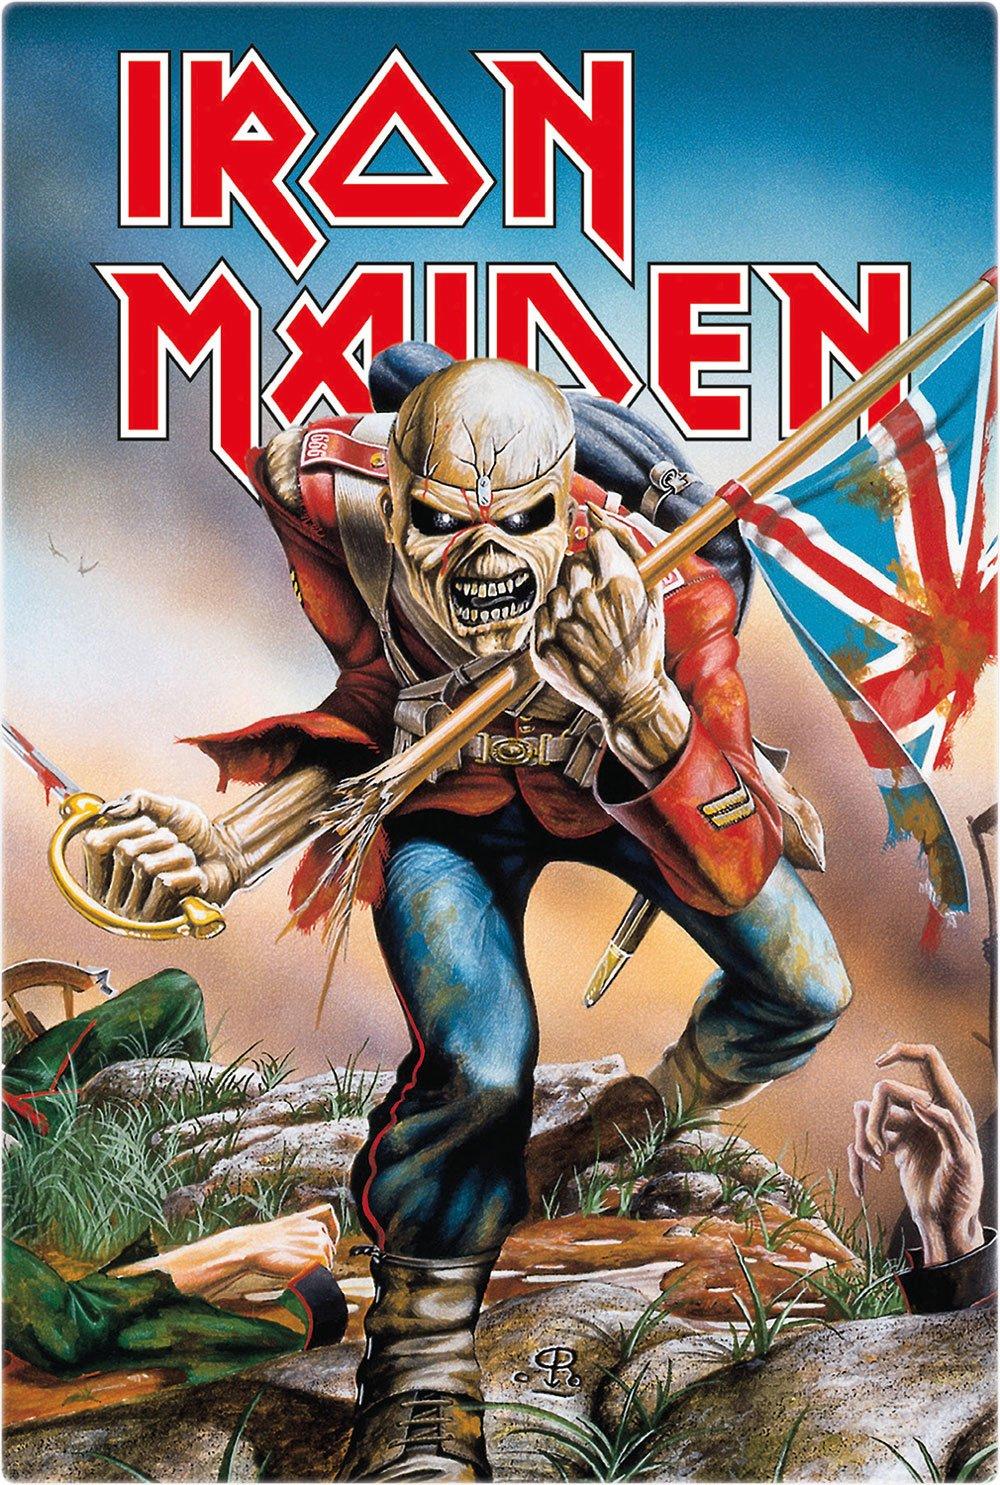 Iron Maiden Tin Sign Trooper 20 x 30 cm